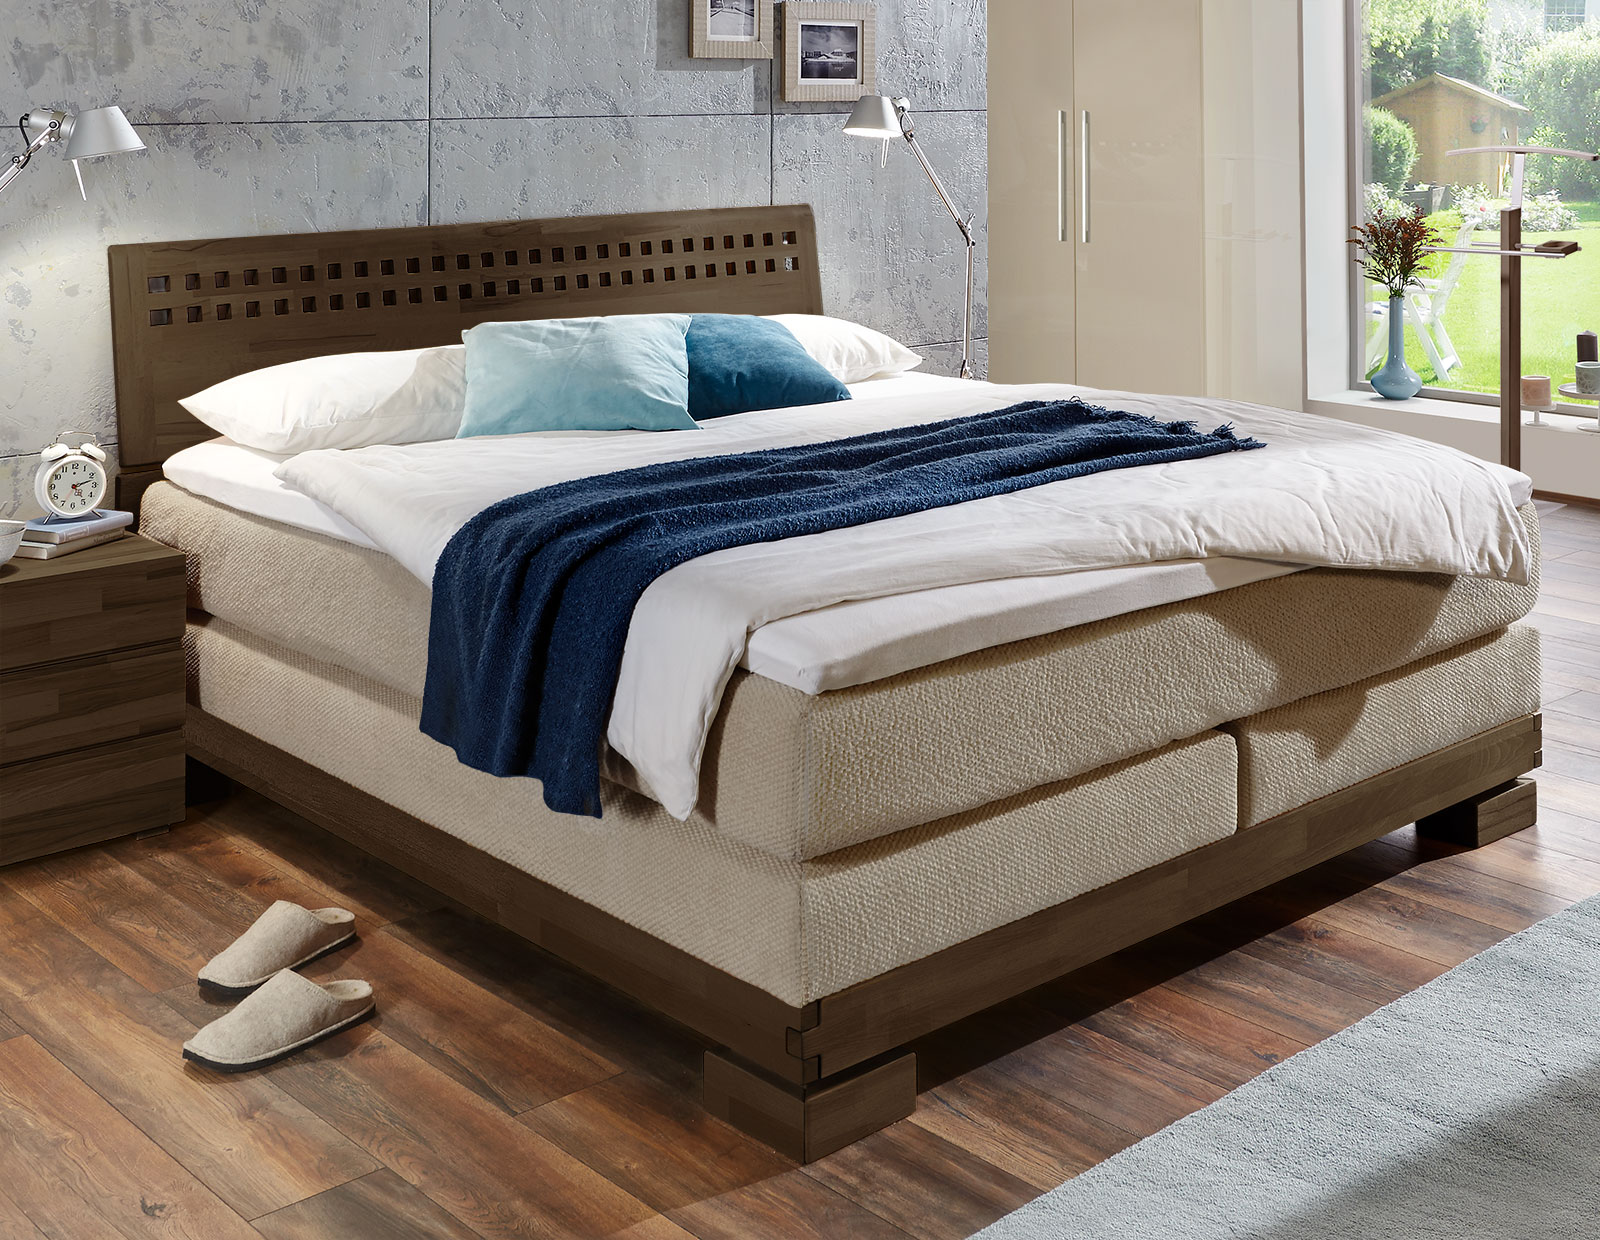 massivholz boxspringbett aus kernbuche in 180x200 piacenza. Black Bedroom Furniture Sets. Home Design Ideas